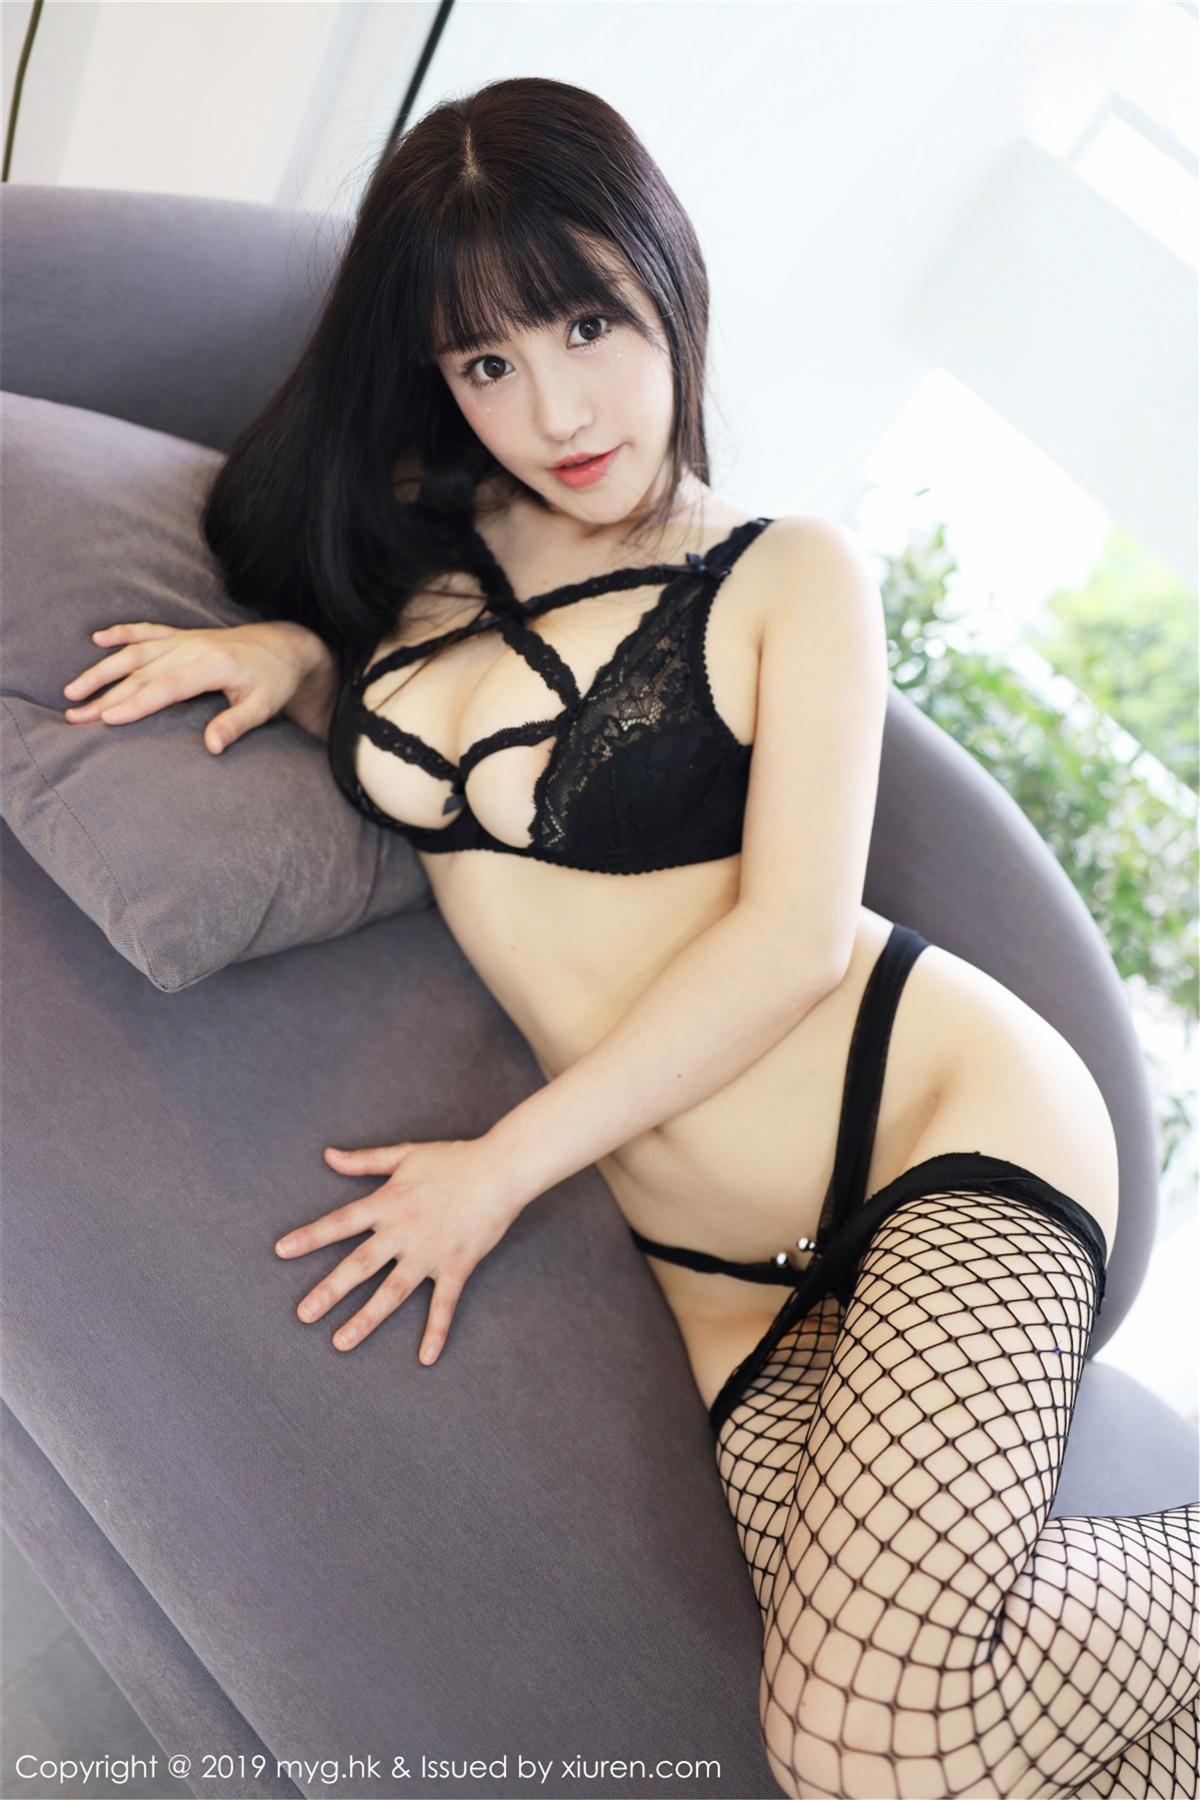 MyGirl Vol.357 6P, mygirl, Zhu Ke Er